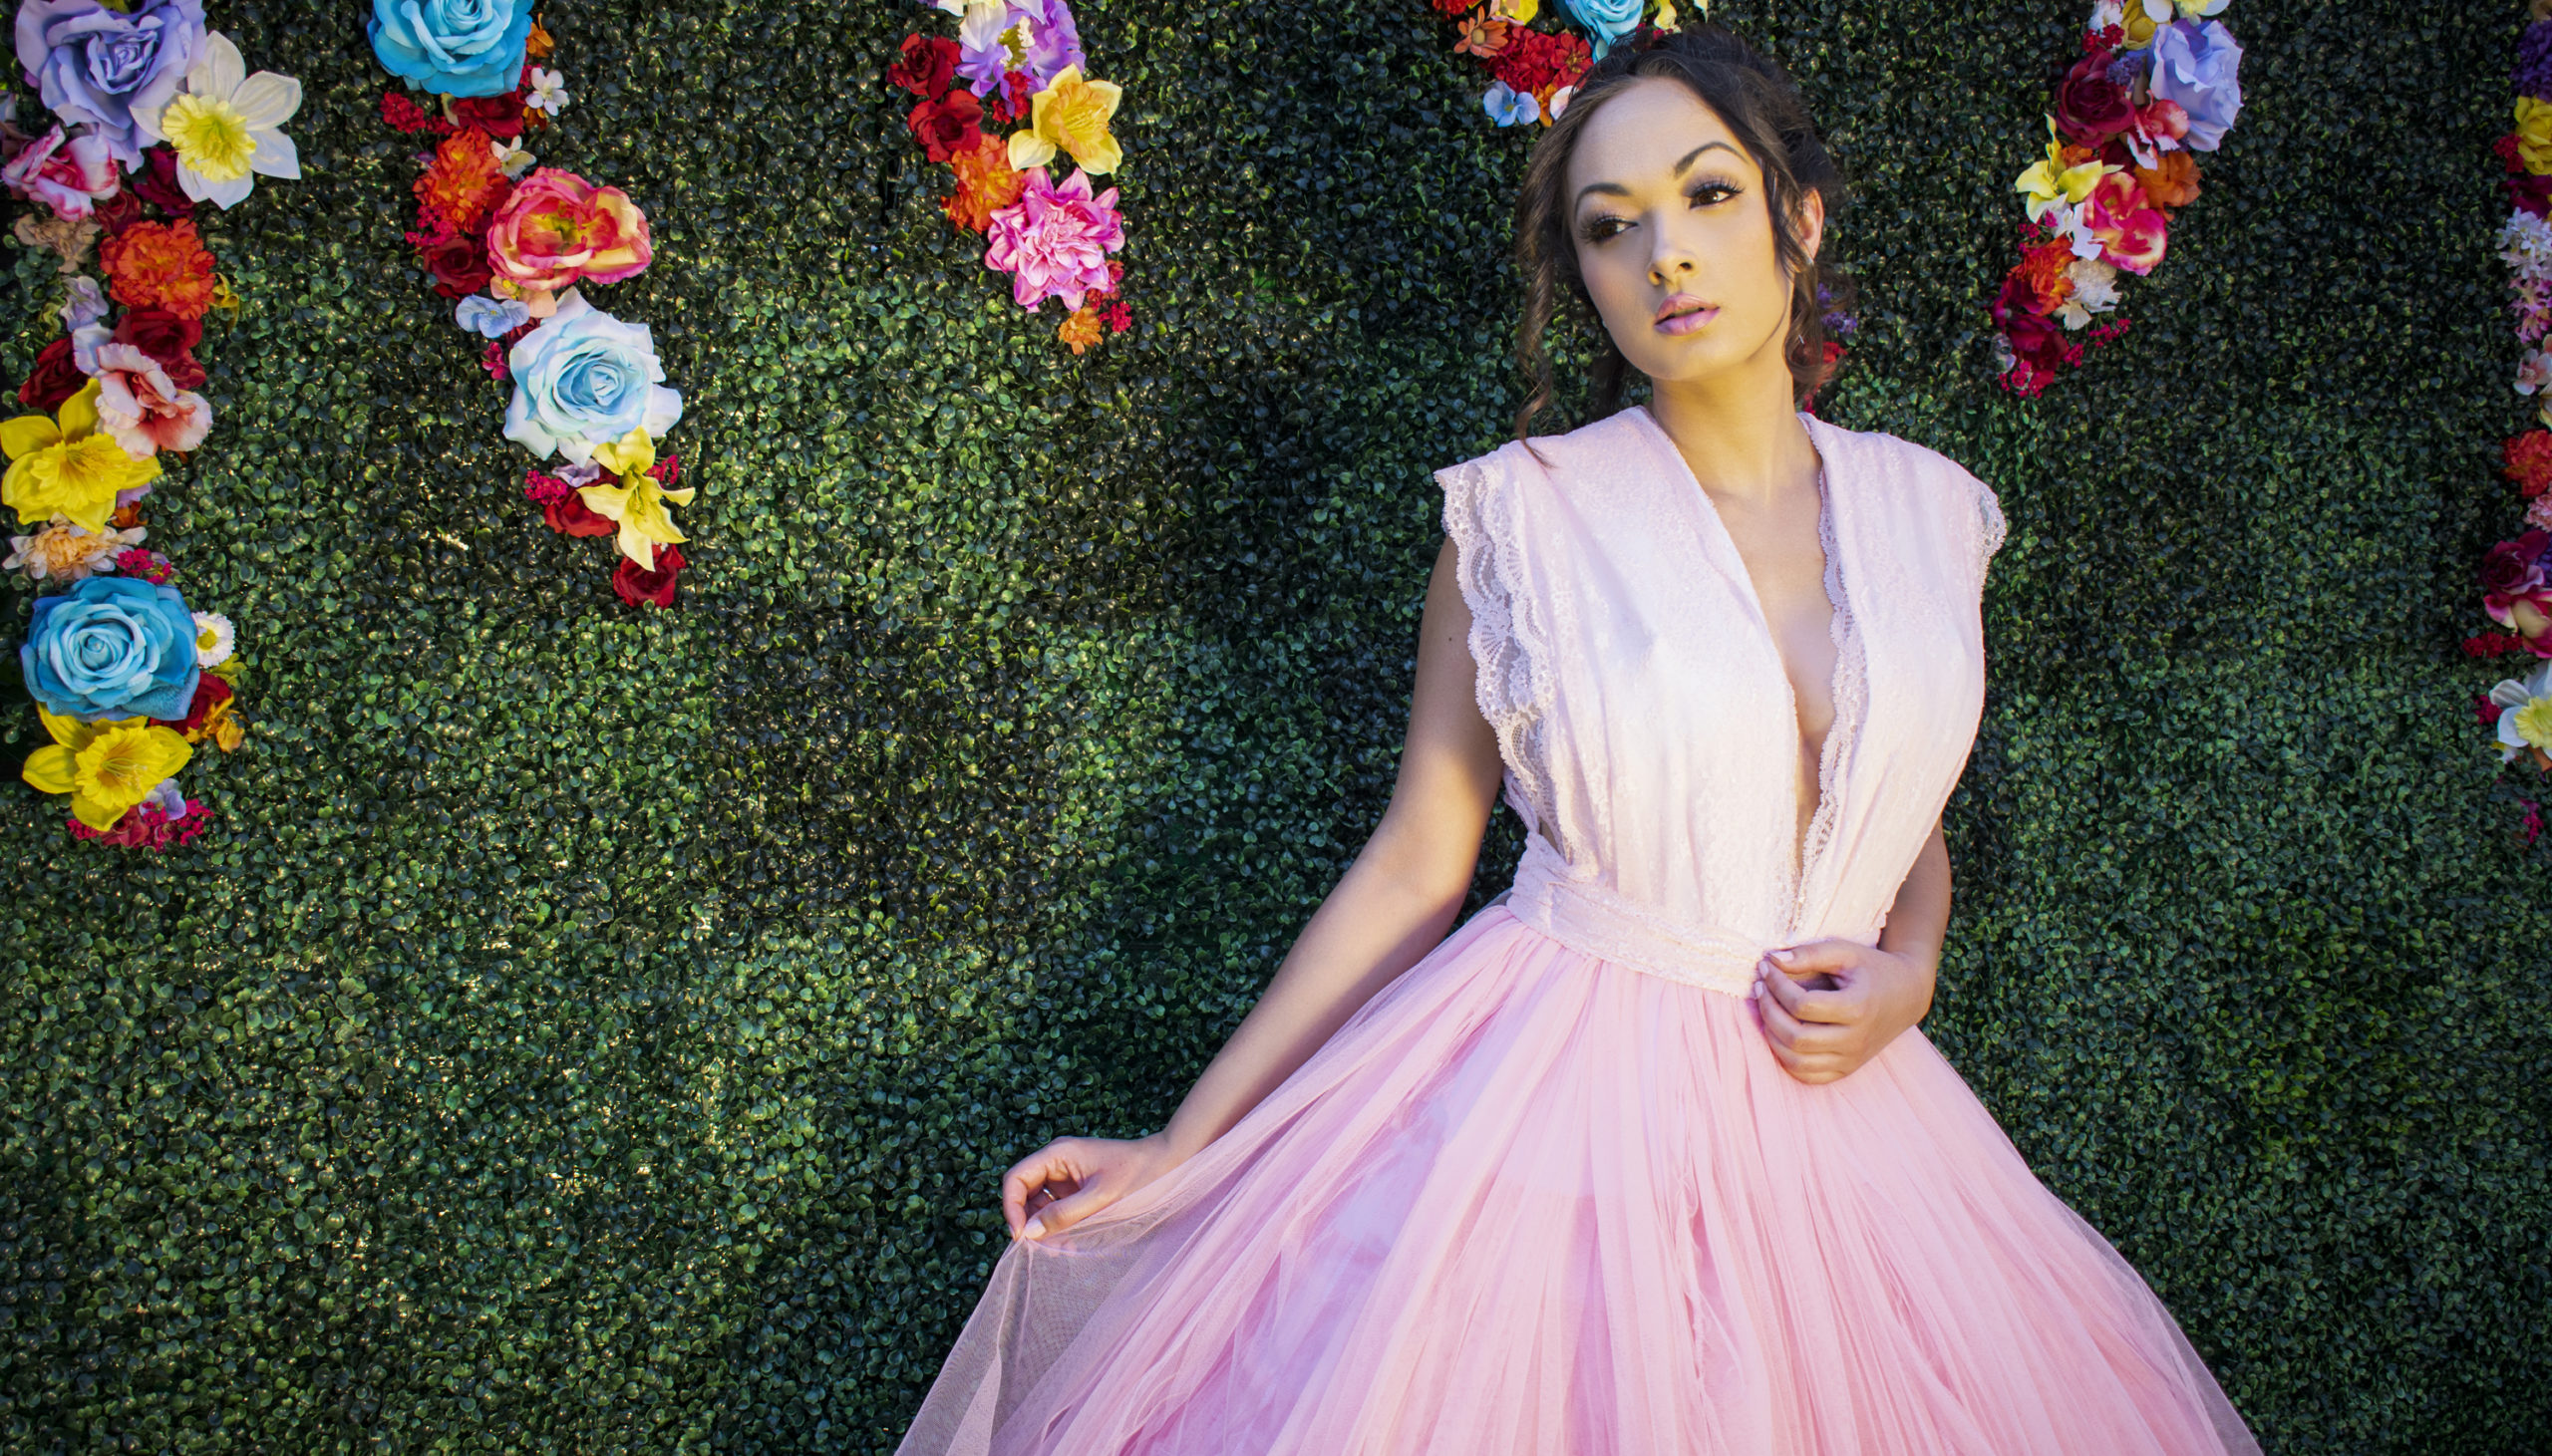 DIY Rom Challenge Pink BallGown by Heather Spears